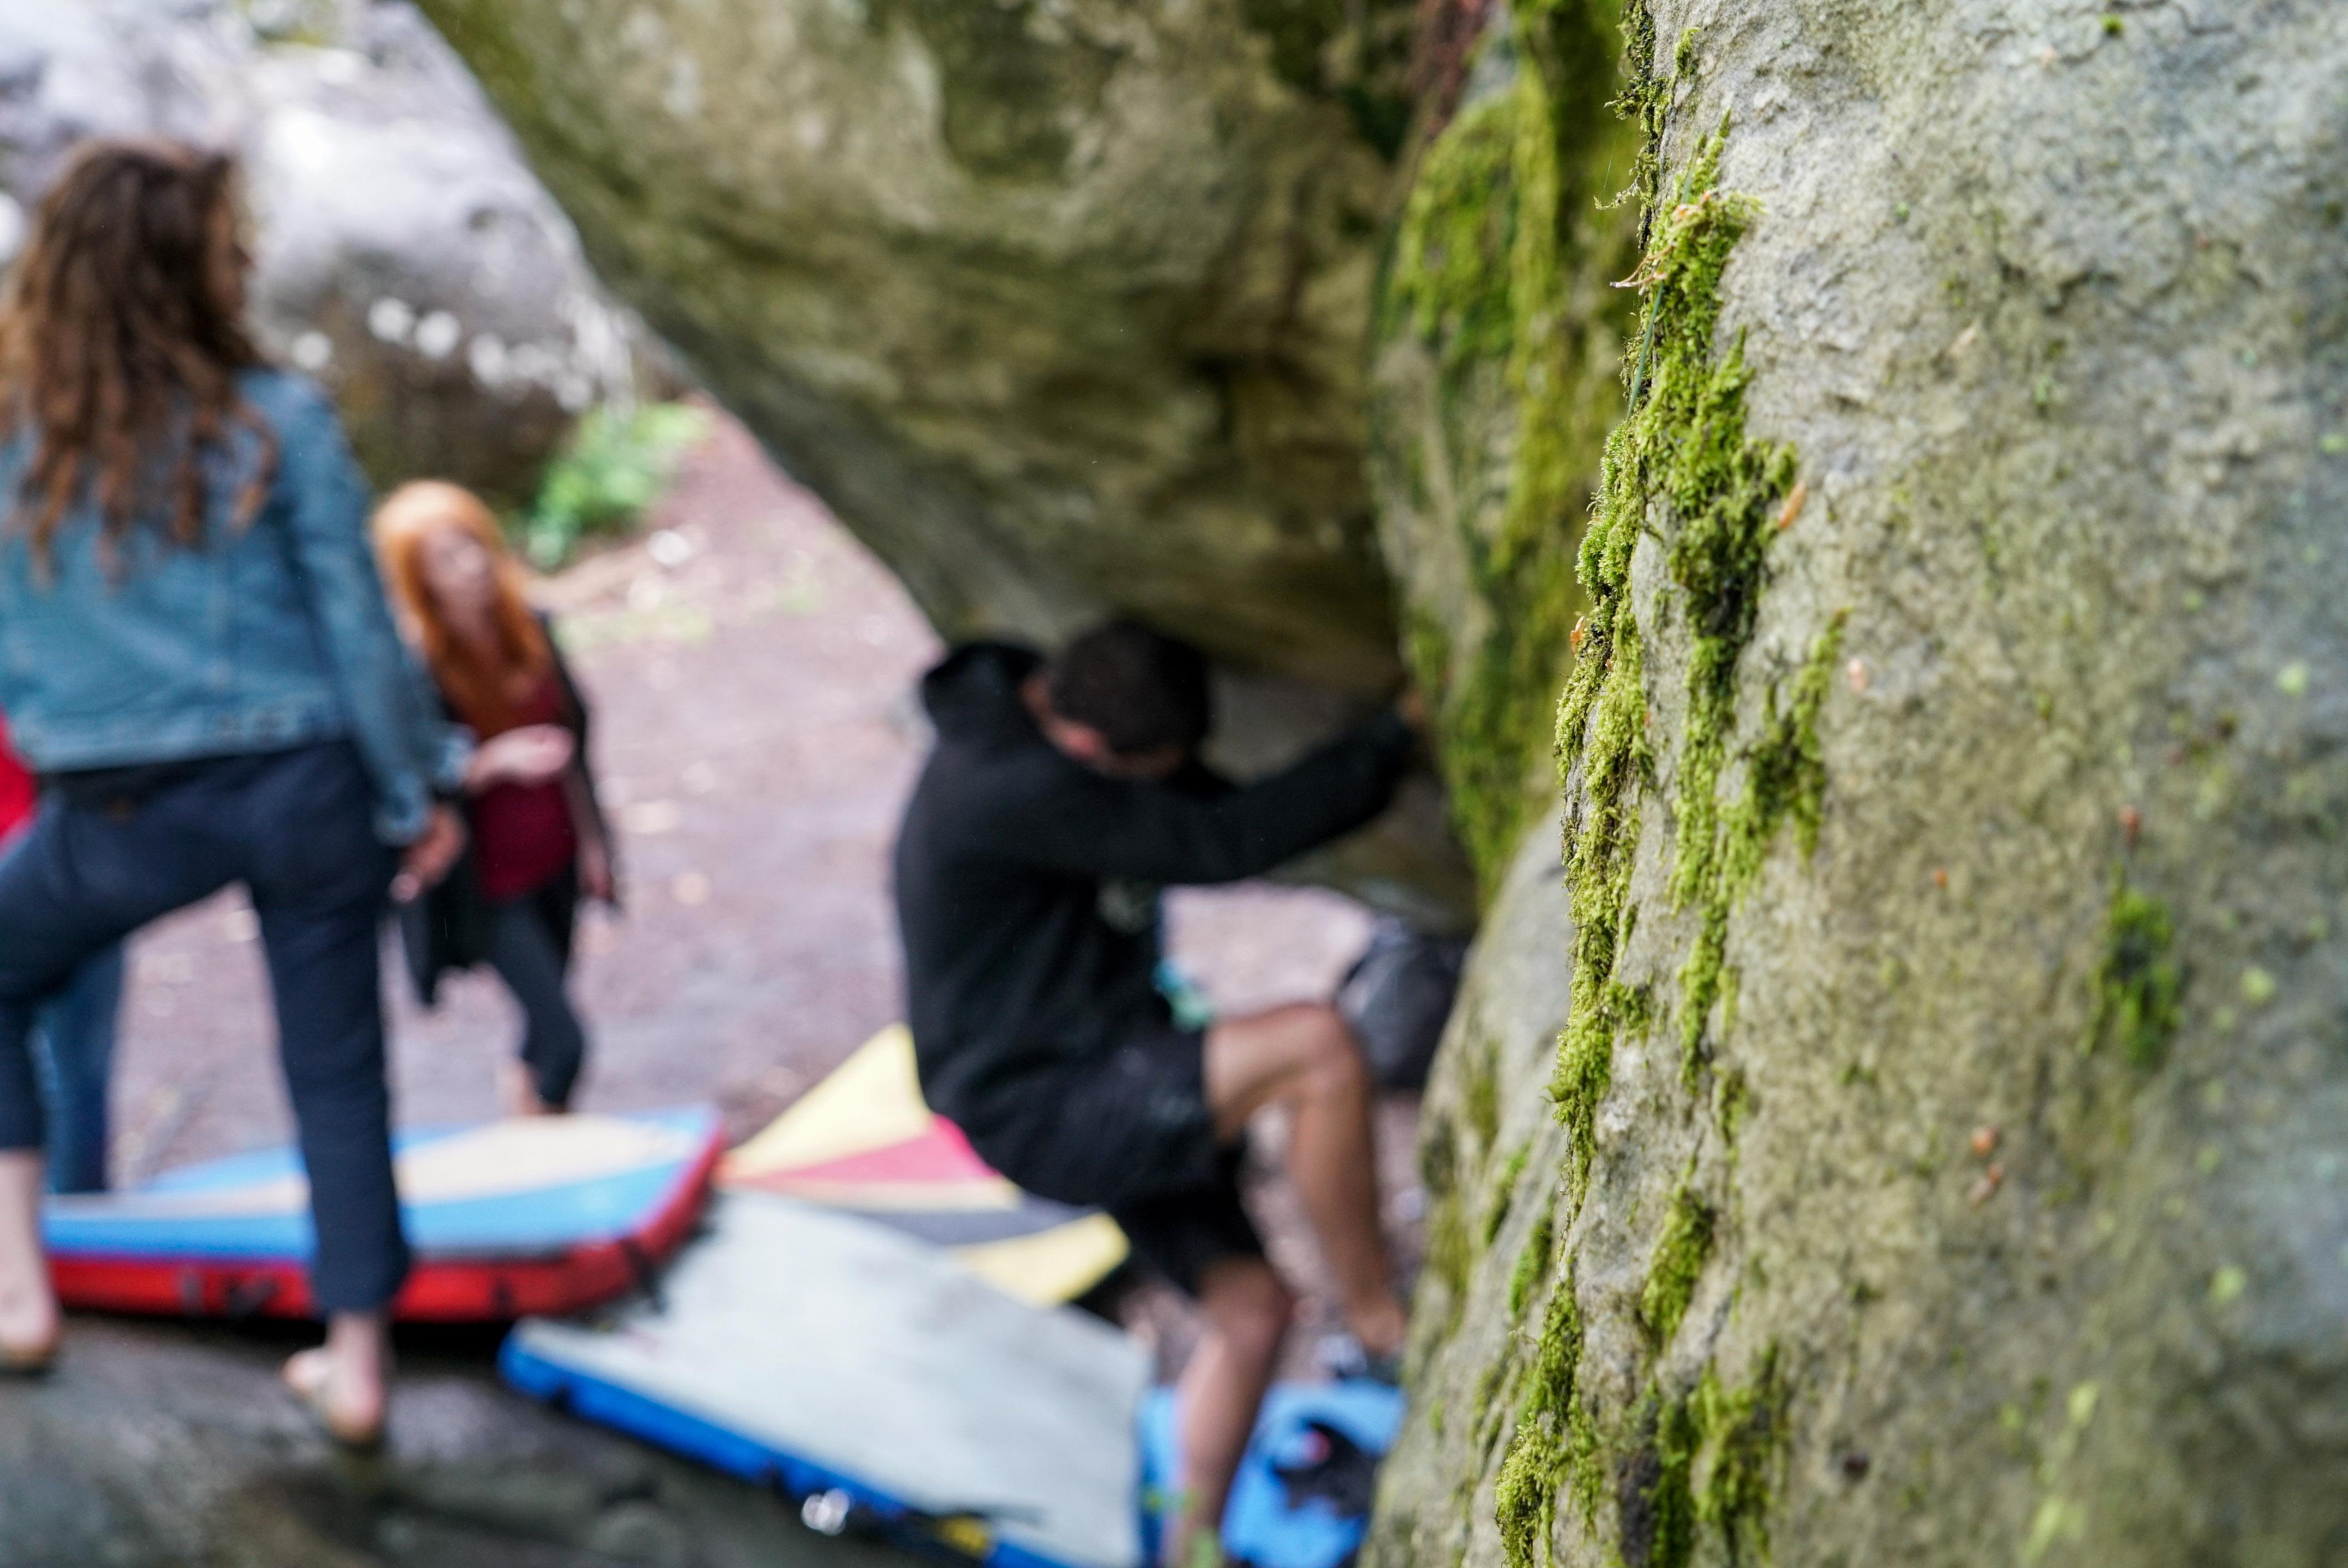 fontainbleau climbing 2016 mike brindley-14